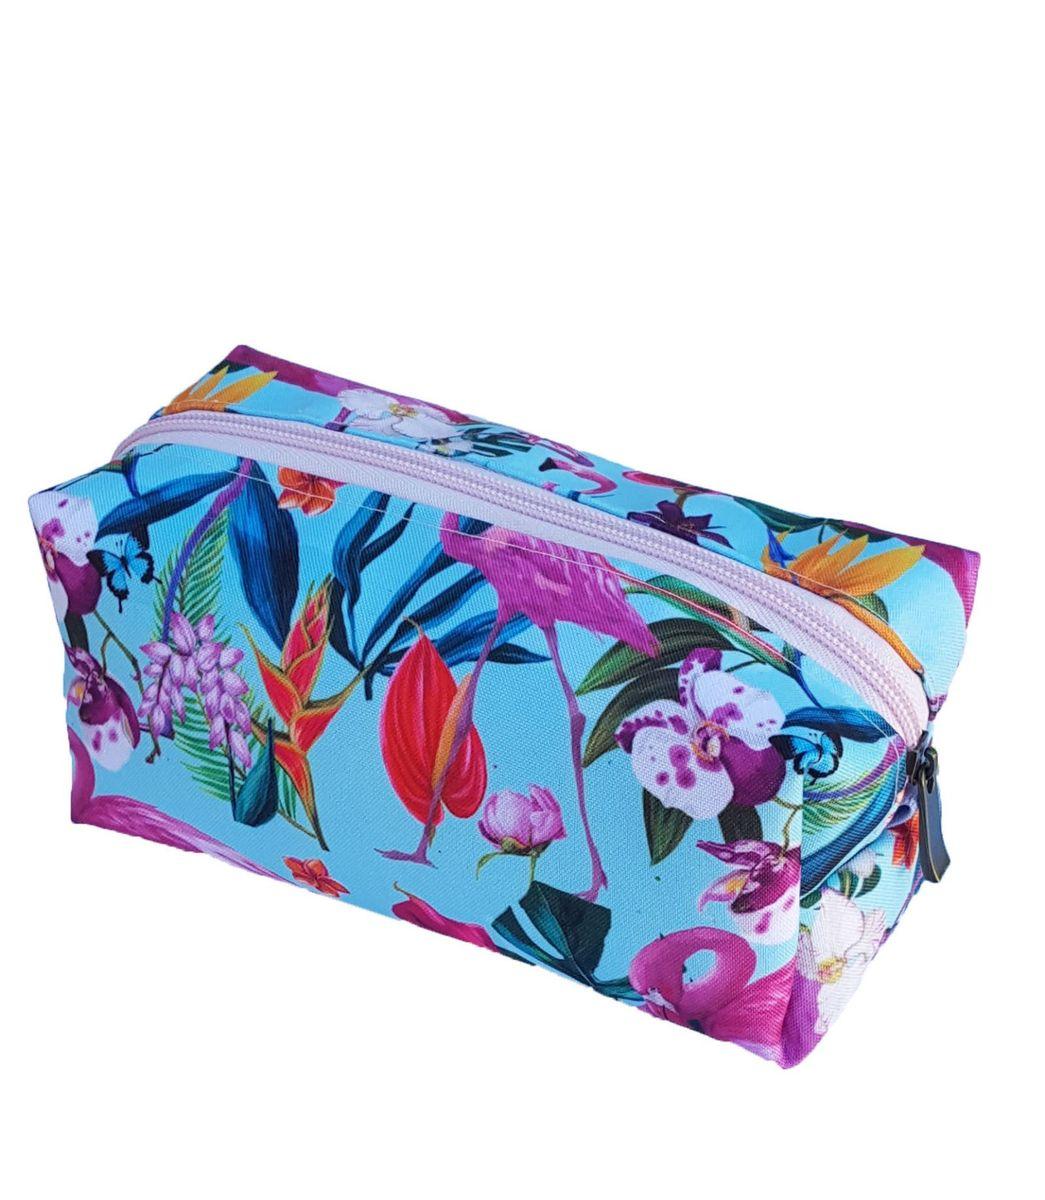 99038dc7b estojo flamingos tropical - necessaire gloss shop.  Czm6ly9wag90b3muzw5qb2vplmnvbs5ici9wcm9kdwn0cy8xmtcwodyvn2vkndvjnmqxnzzim2m4ndg2nmq1njqwmgriyjewywmuanbn